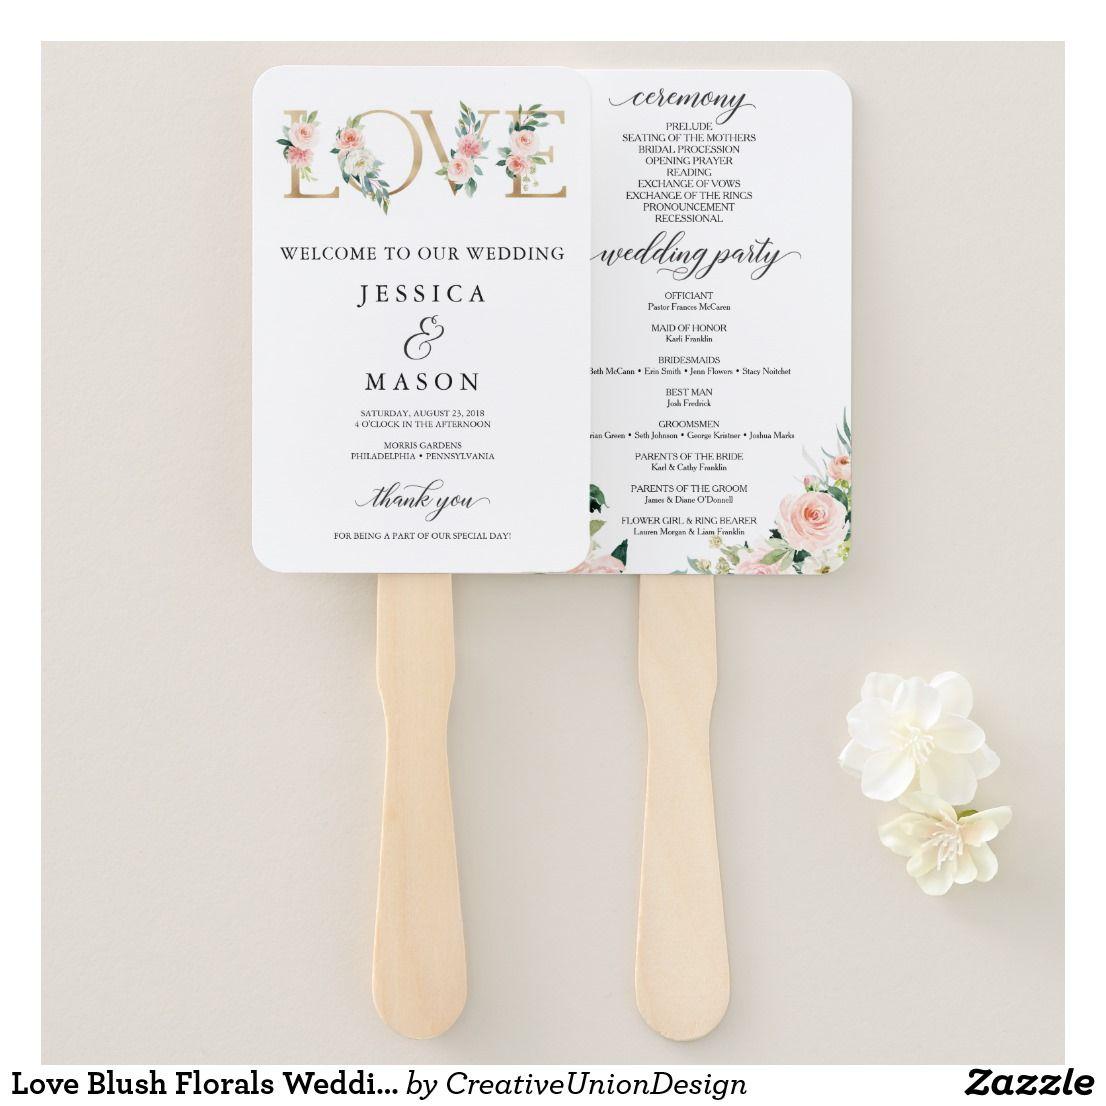 Love blush florals wedding program fan outdoor wedding ideas